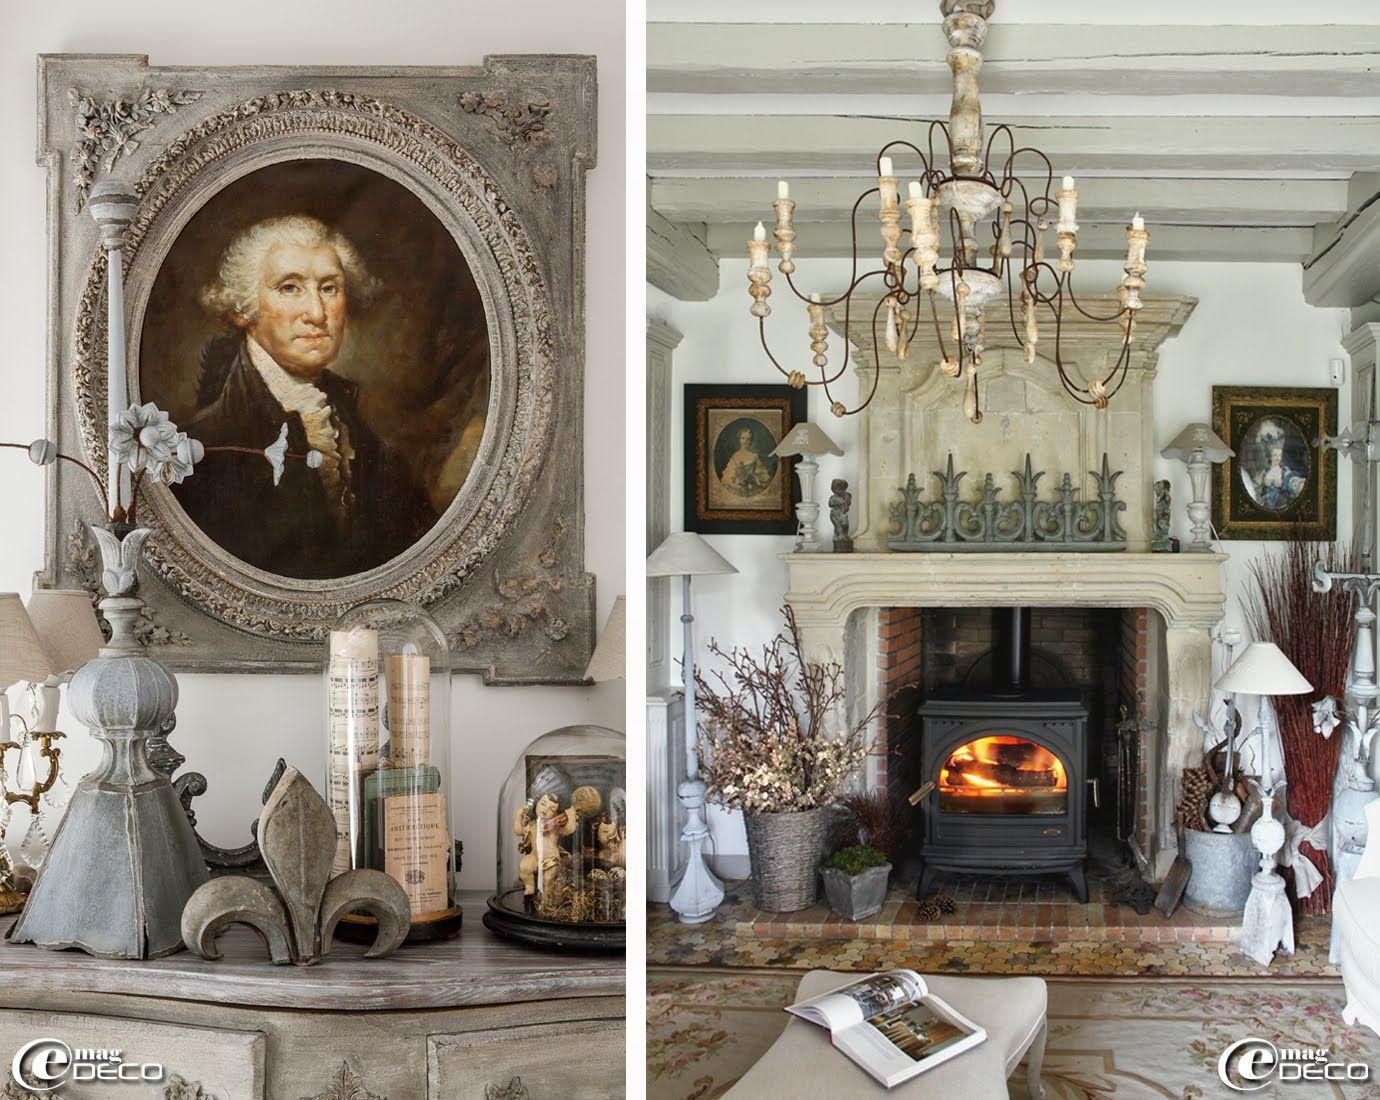 e magdeco magazine de d coration le clos saint fiacre le clos de saint fiacre o o. Black Bedroom Furniture Sets. Home Design Ideas